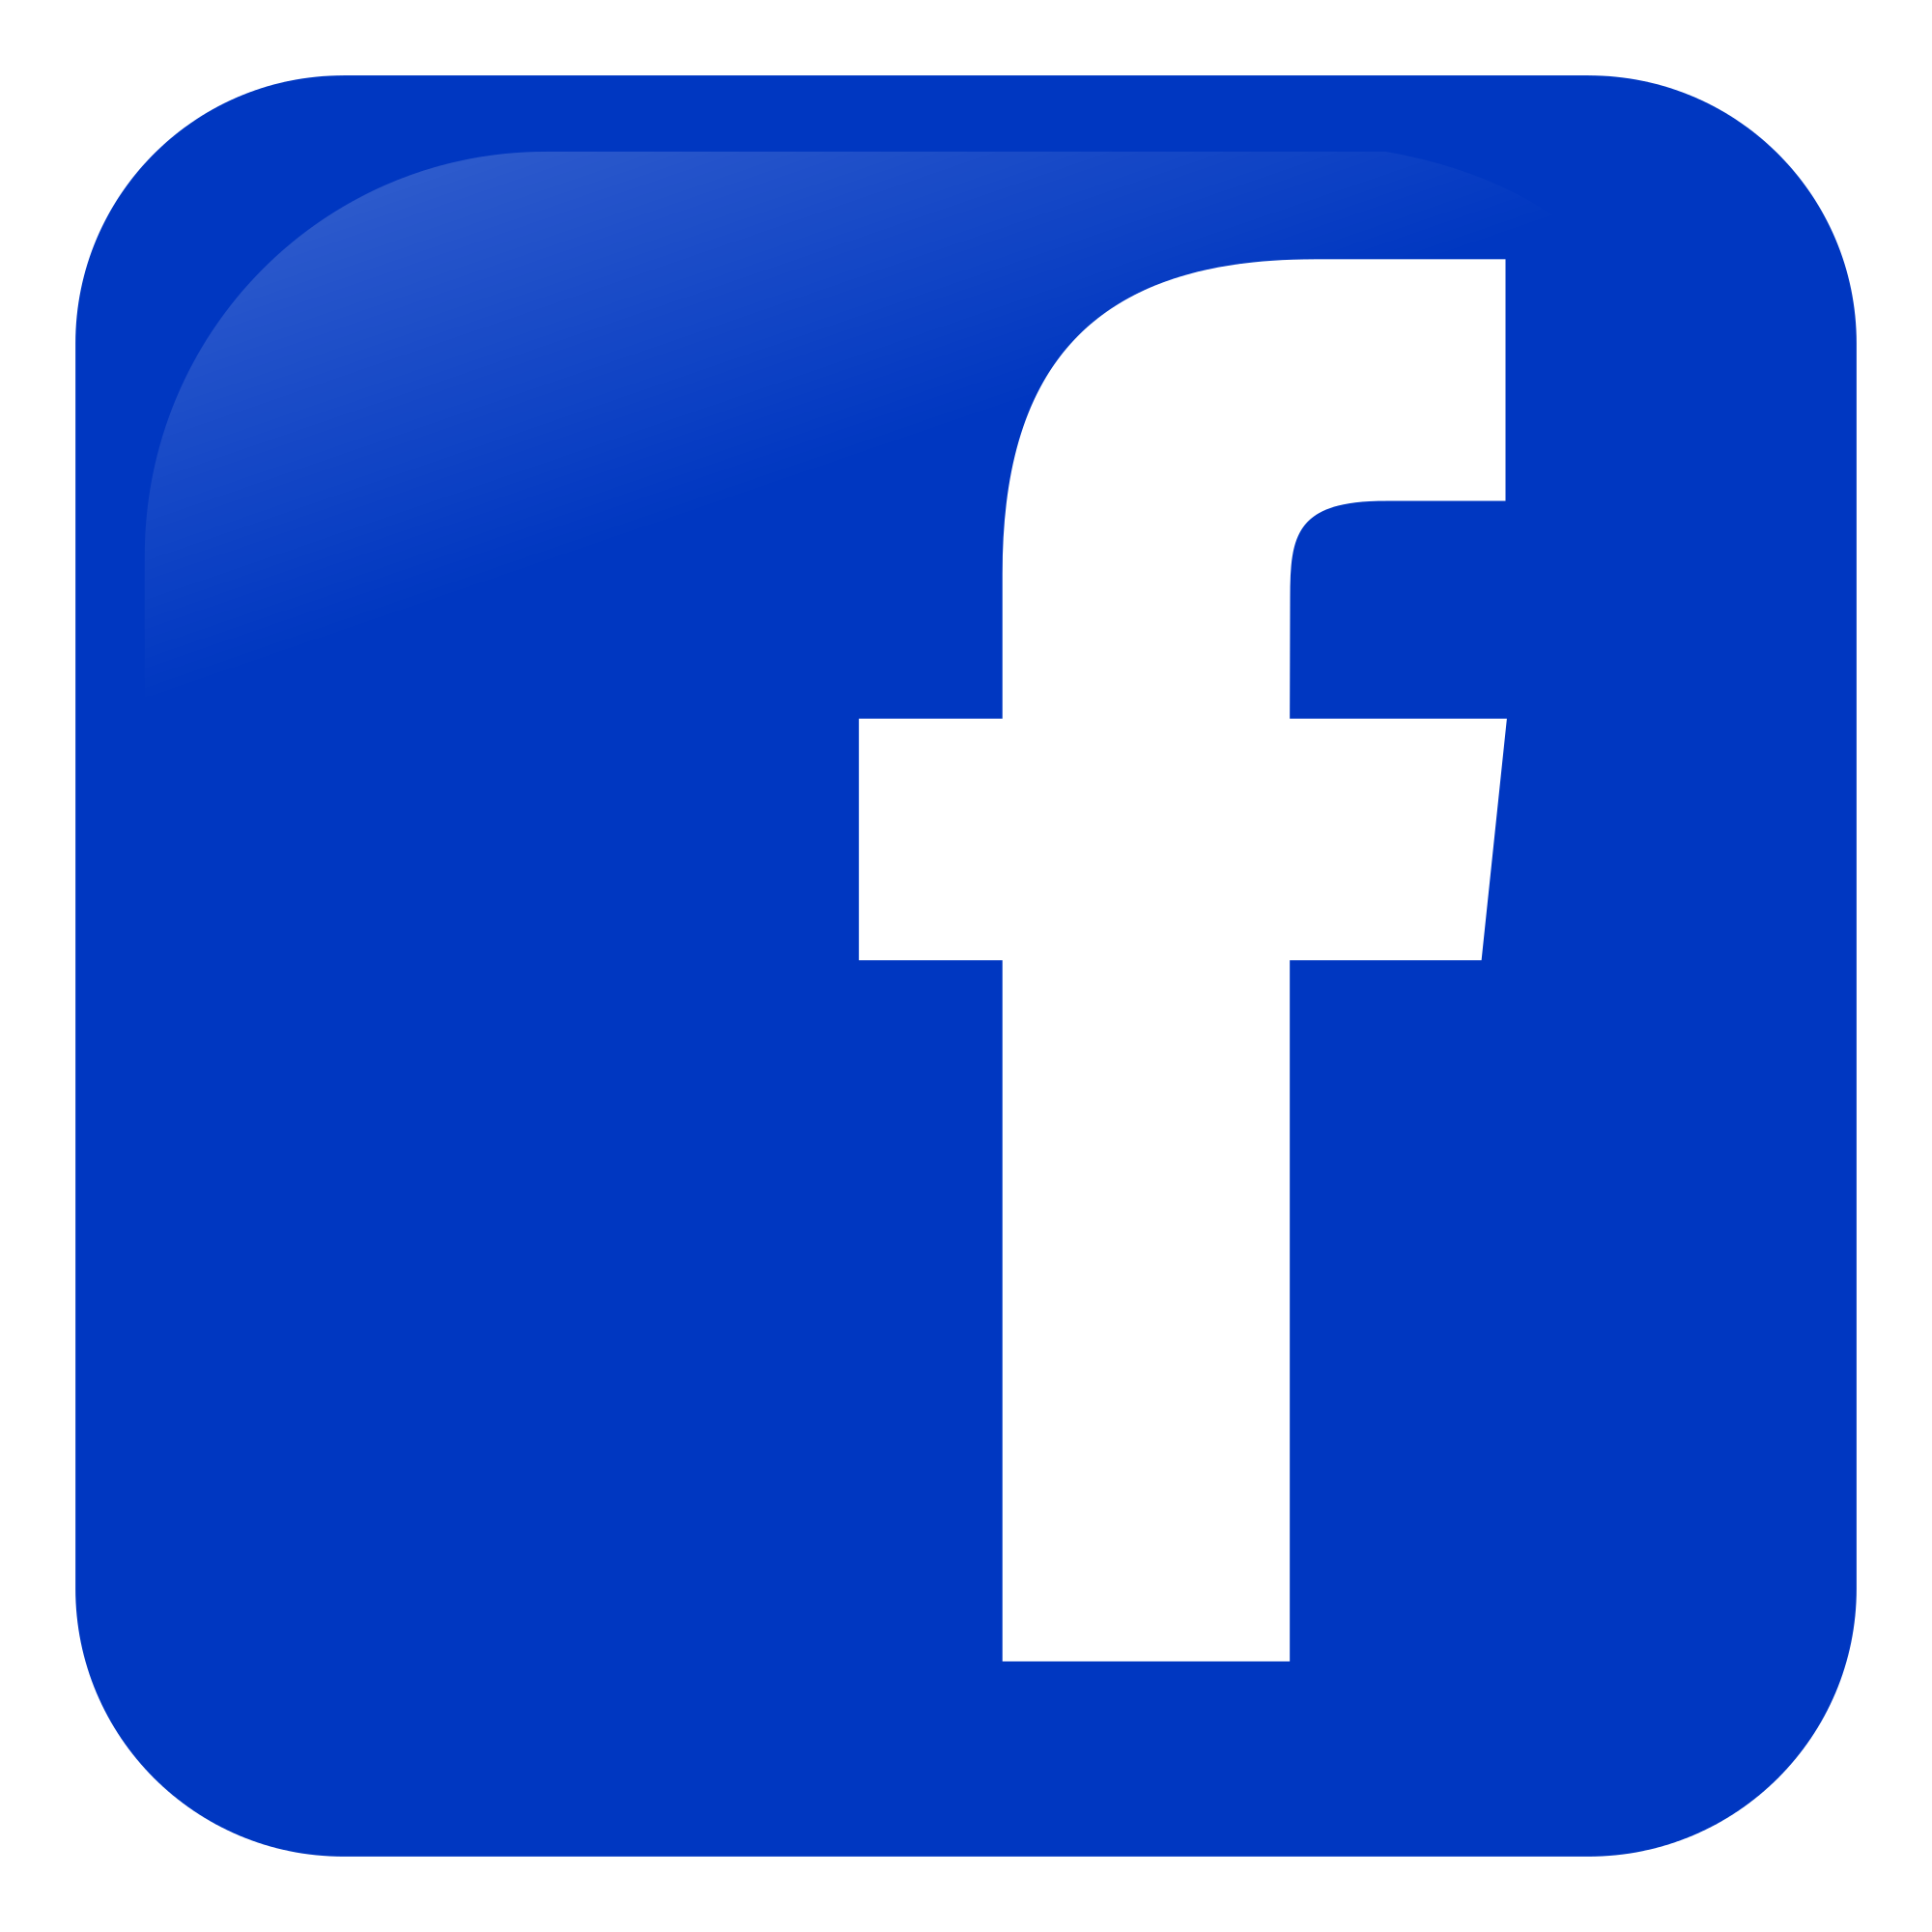 Imagen de facebook clipart svg free download Free Facebook, Download Free Clip Art, Free Clip Art on Clipart Library svg free download